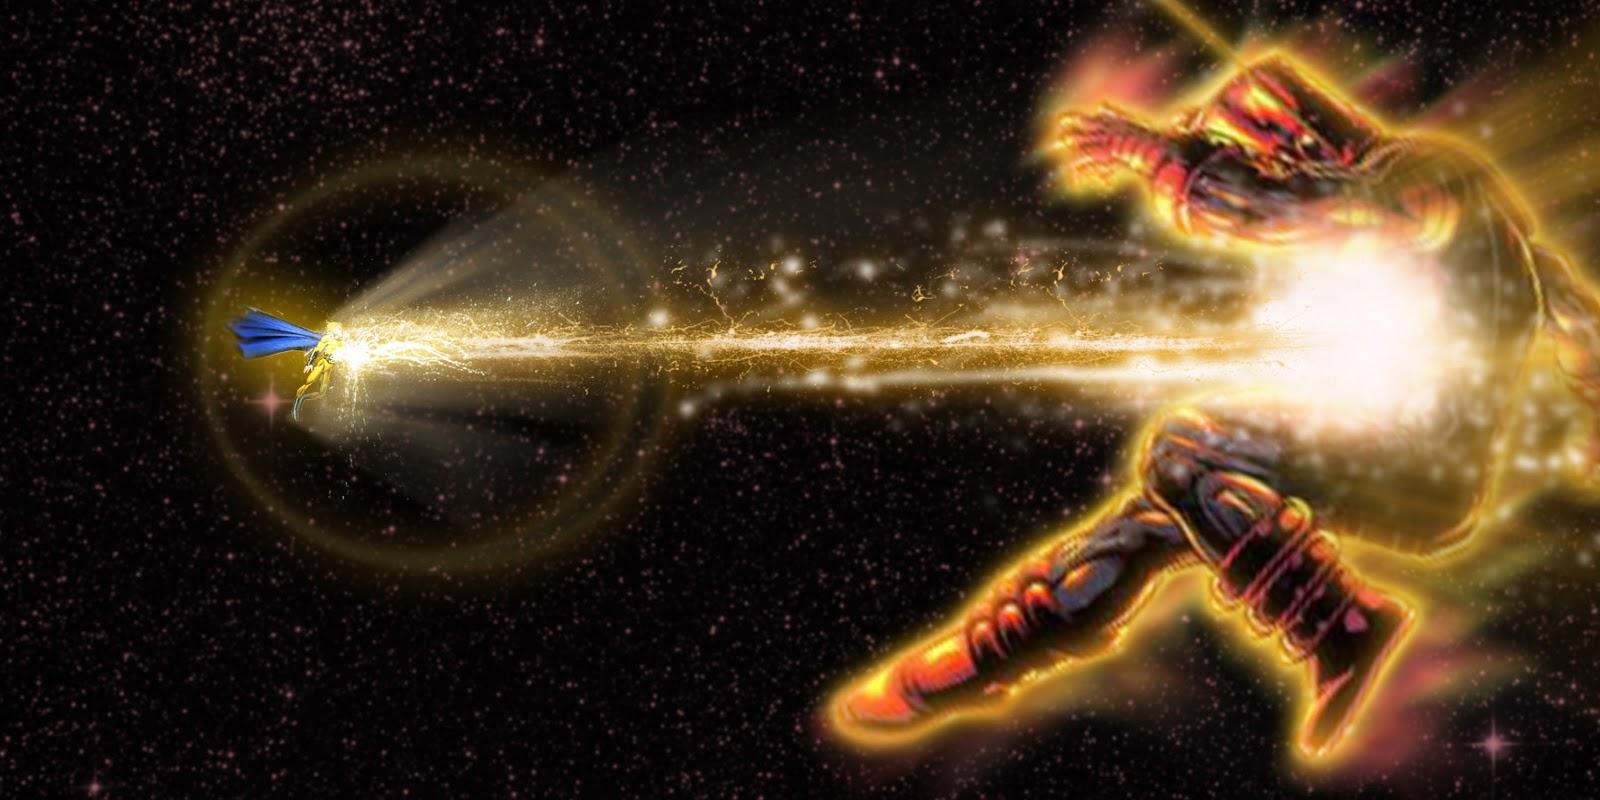 Sentry Vs Doomsday Spacebattles Forums